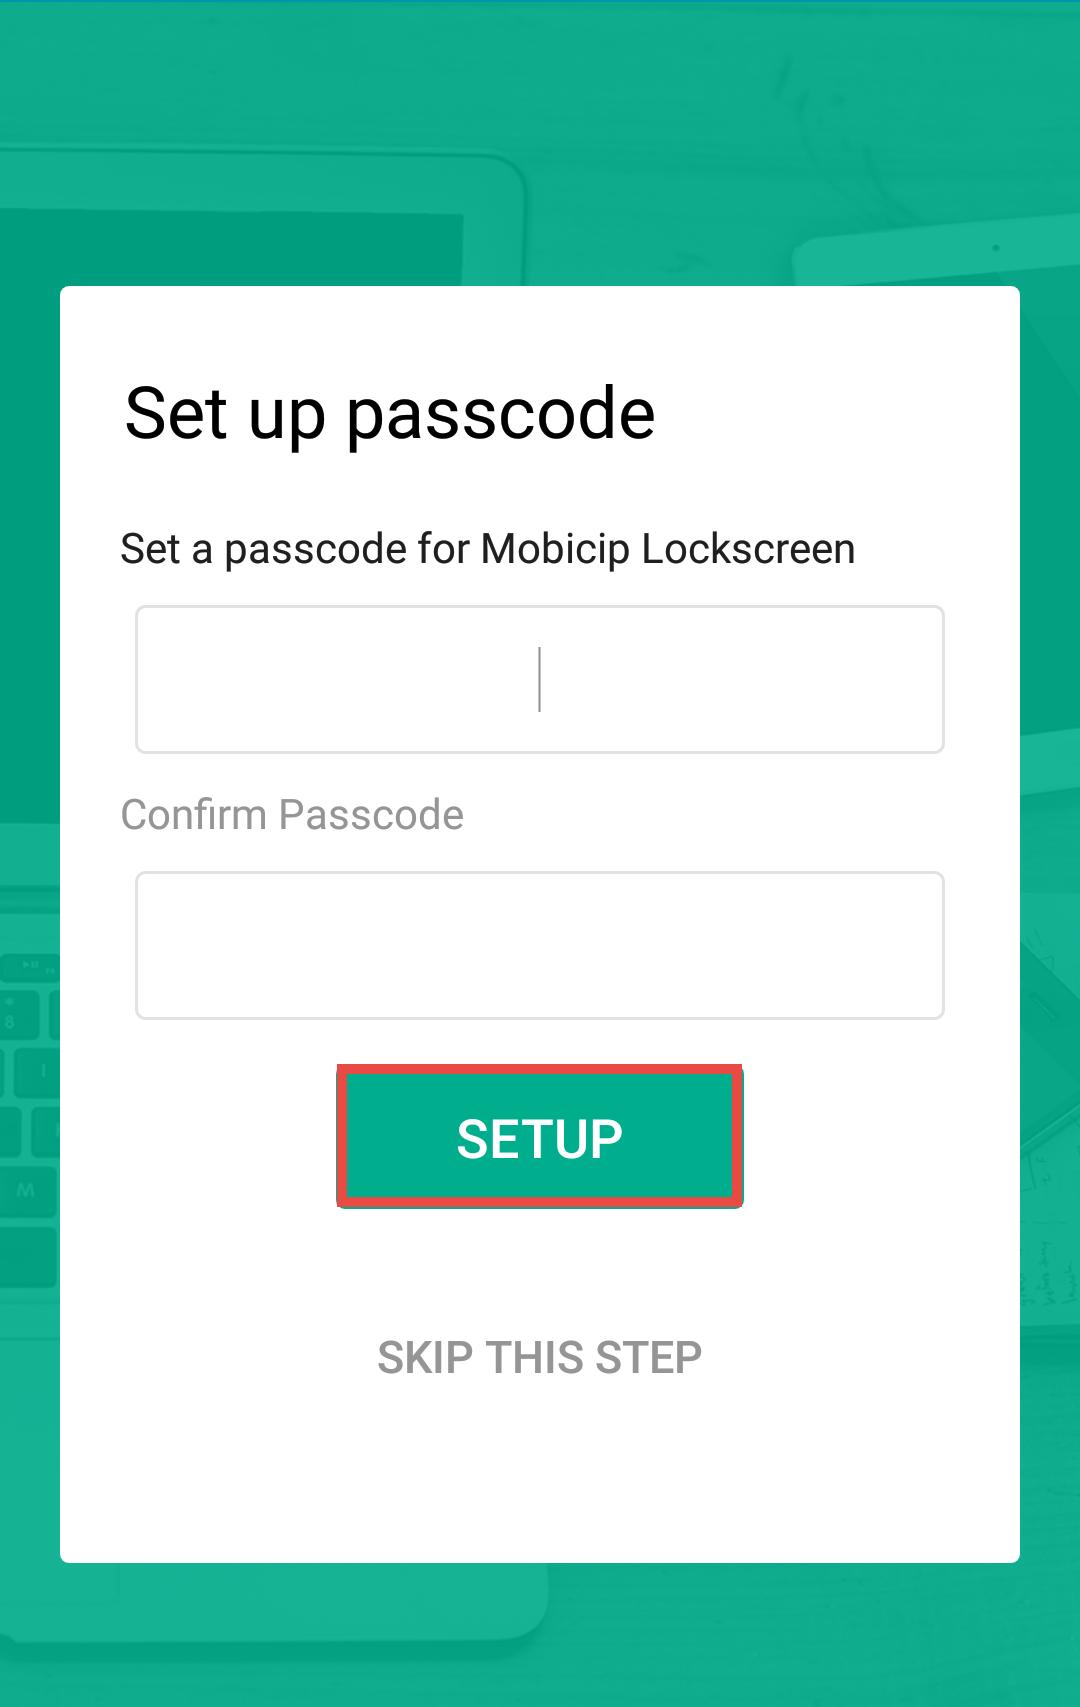 Mobicip LockScreen